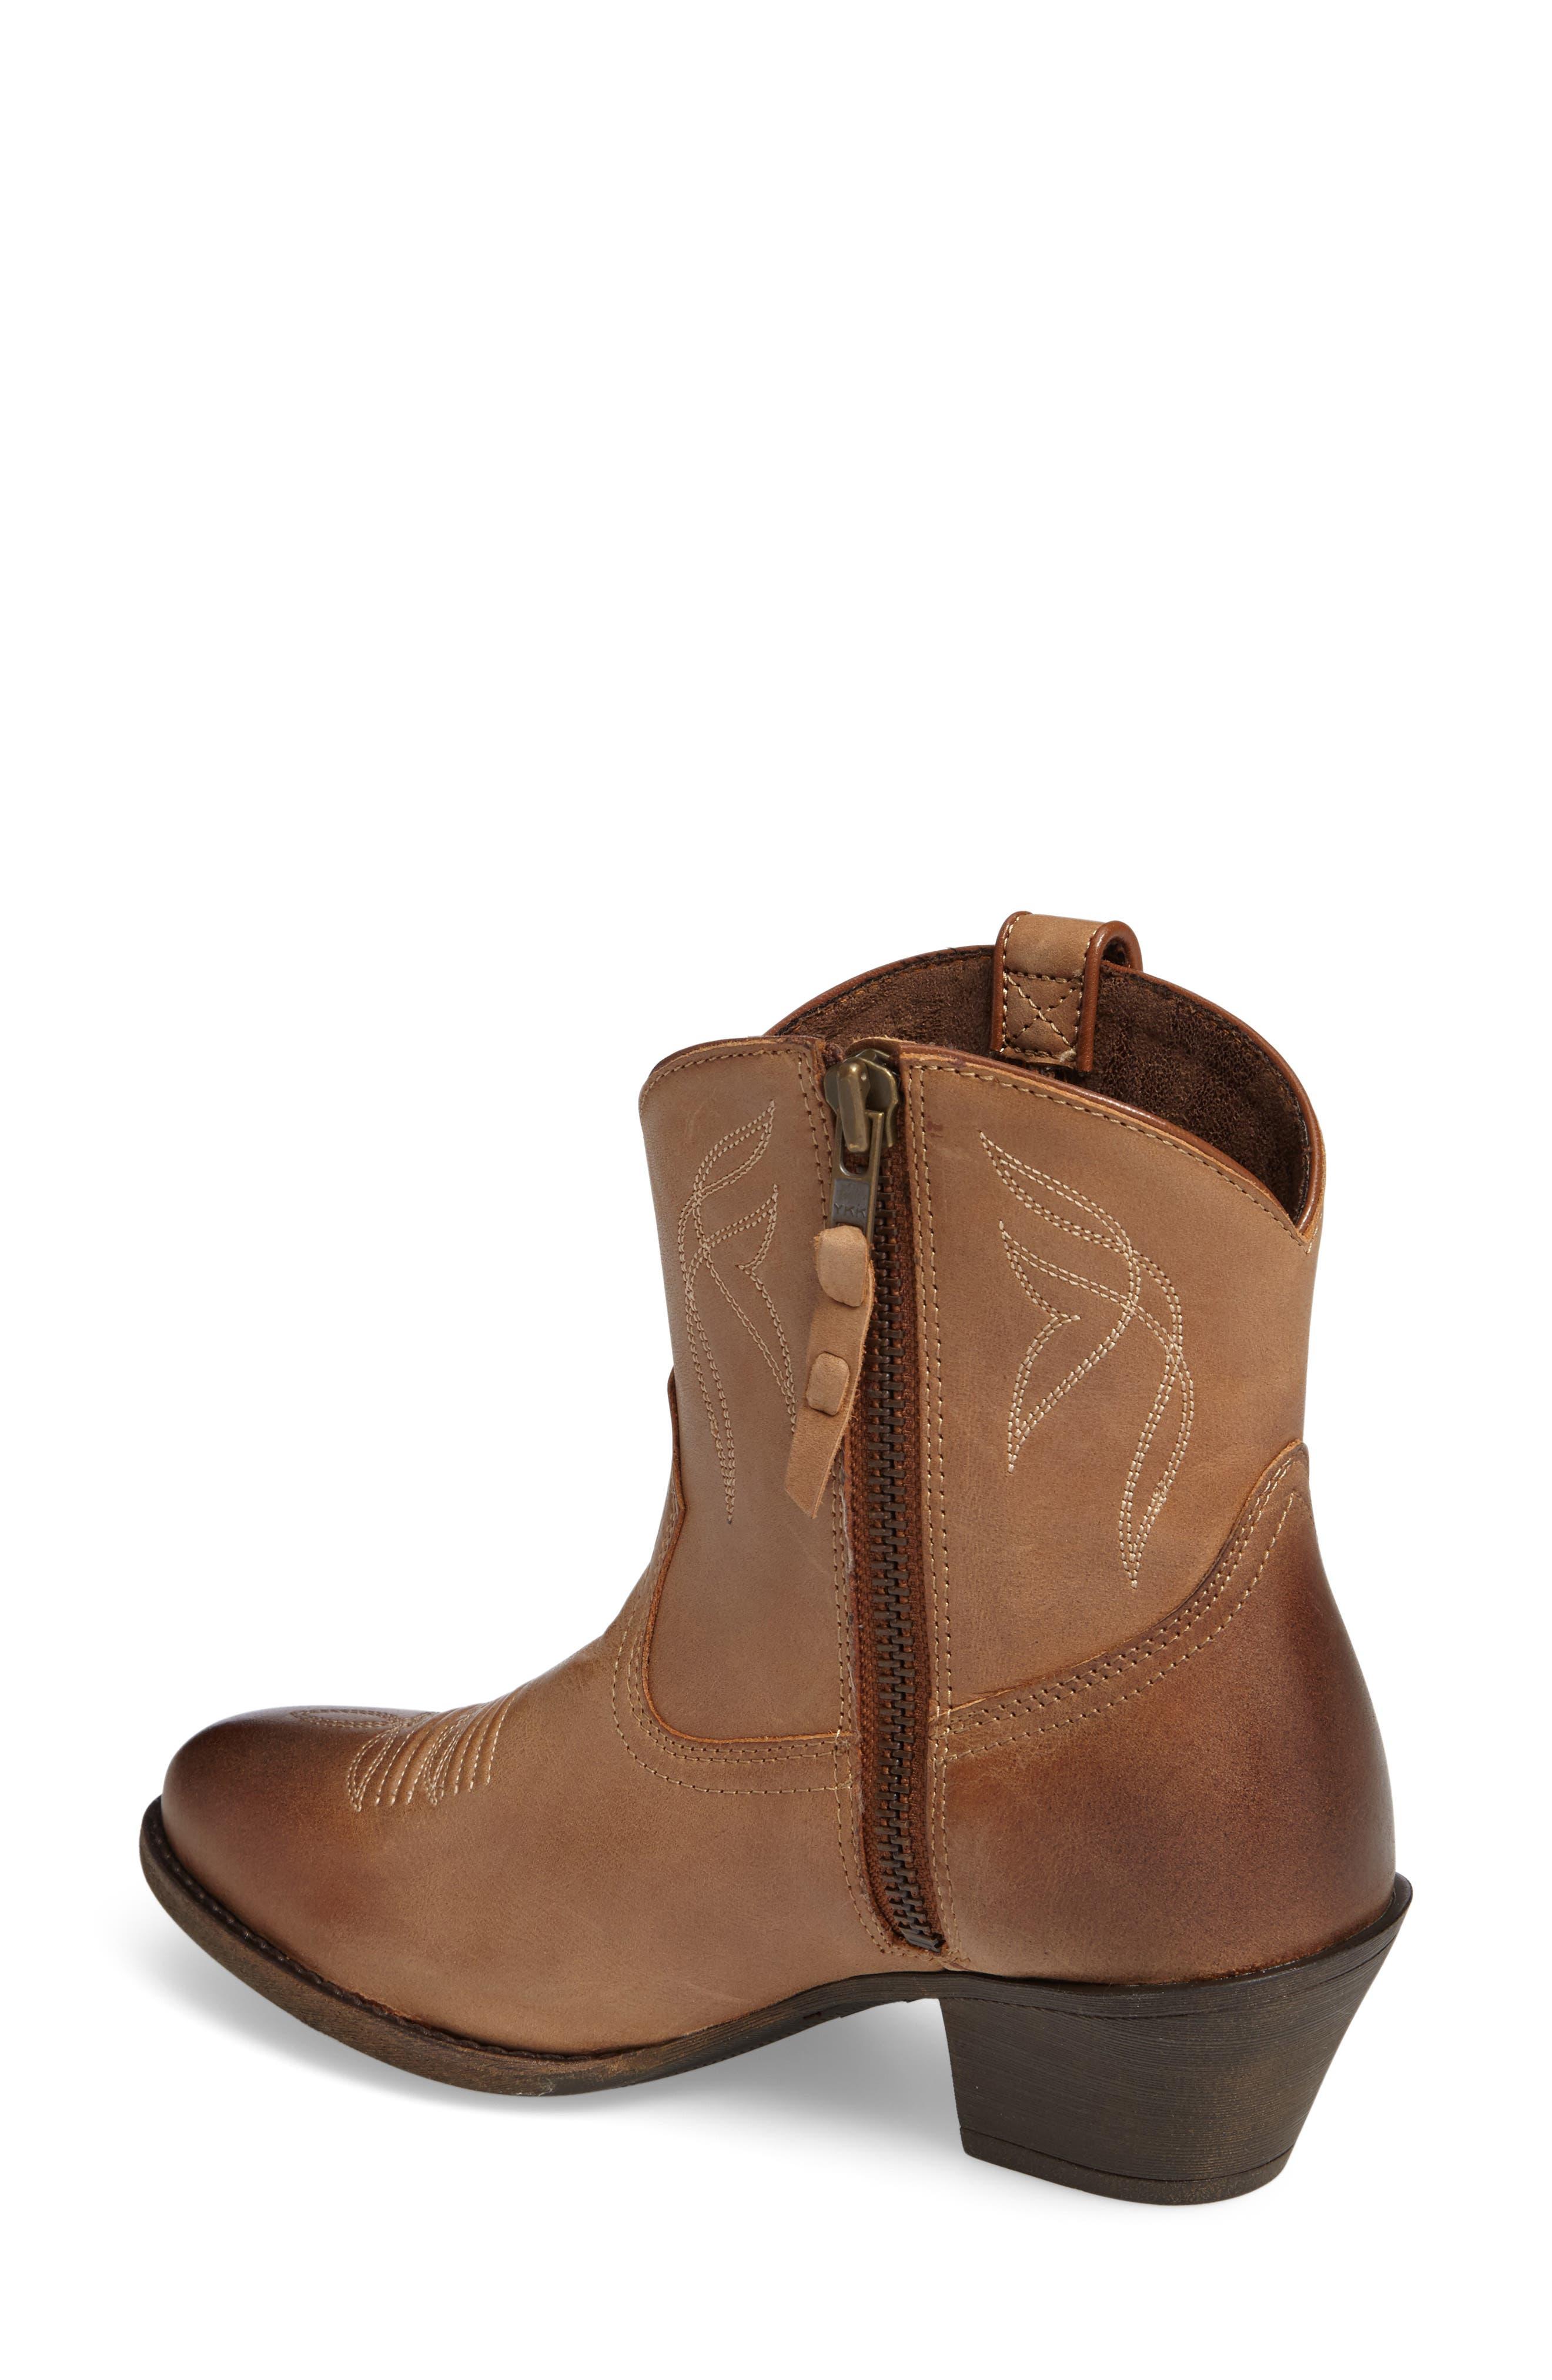 Darlin Short Western Boot,                             Alternate thumbnail 2, color,                             Burnt Sugar Leather